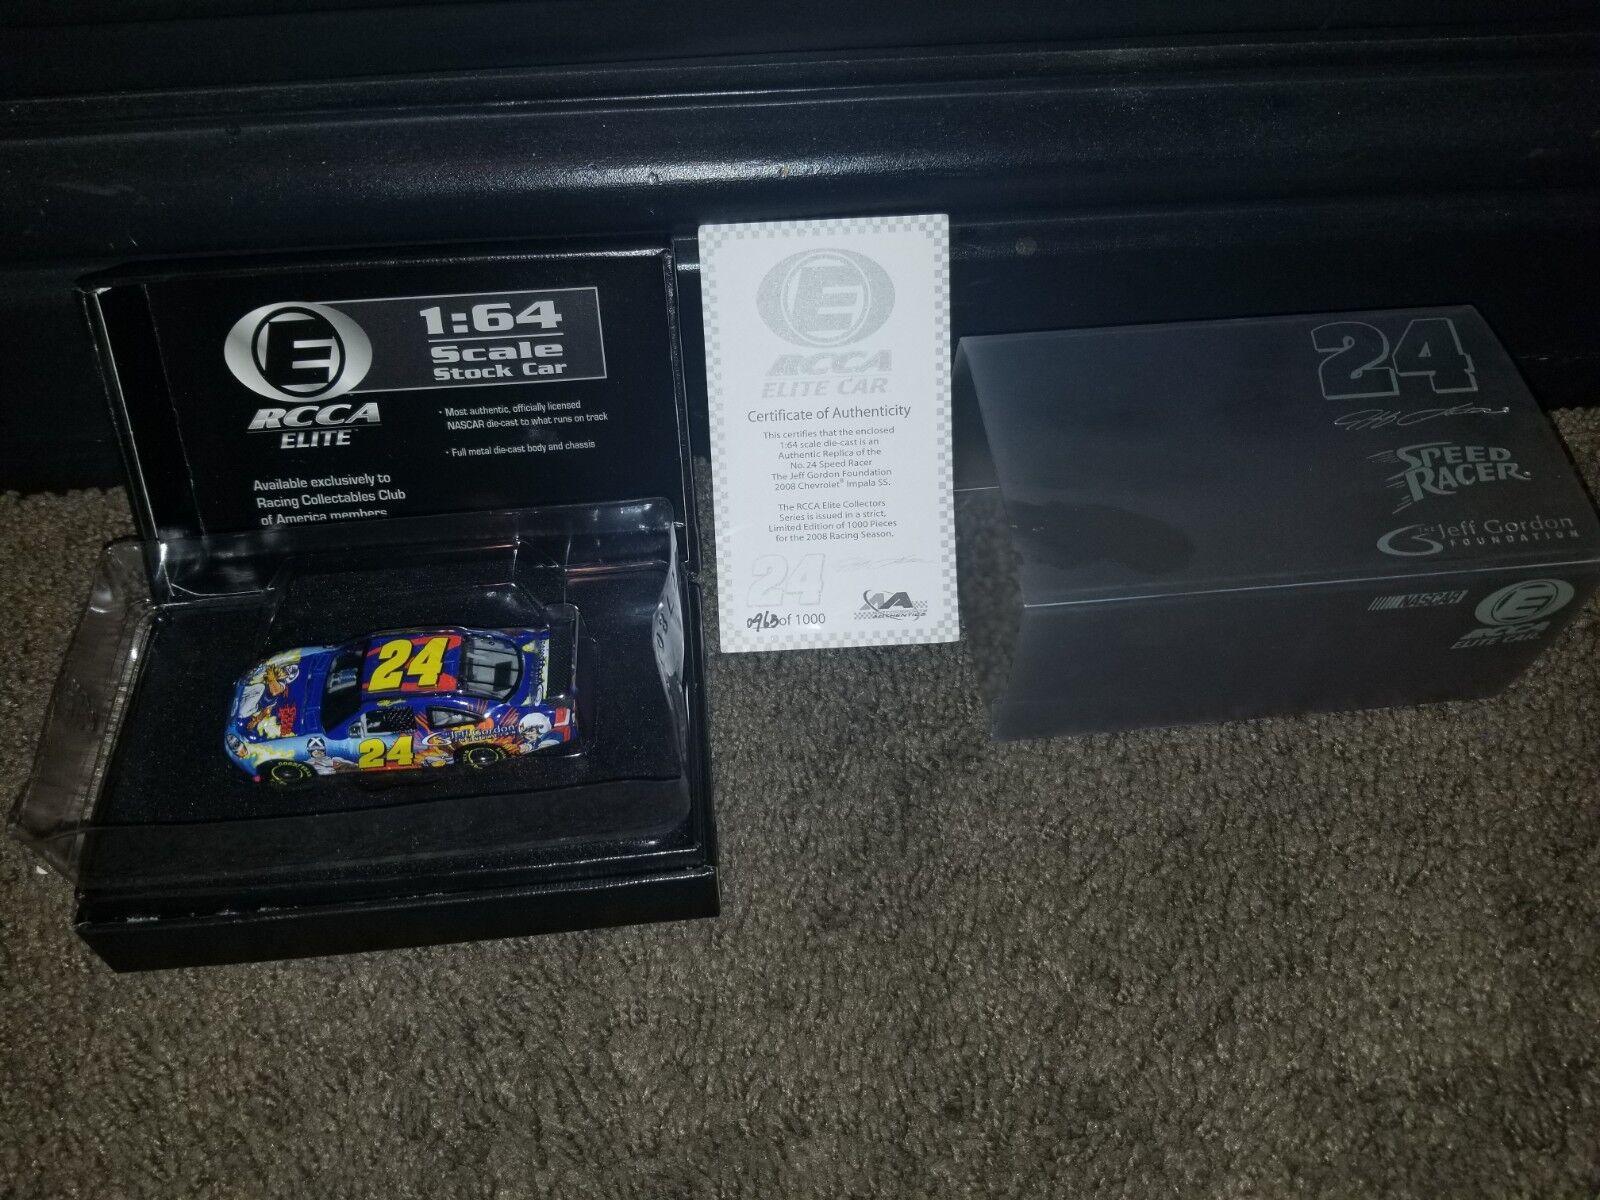 Jeff Gordon Foundation Speed Racer Elite 1 64 Scale with authenticity